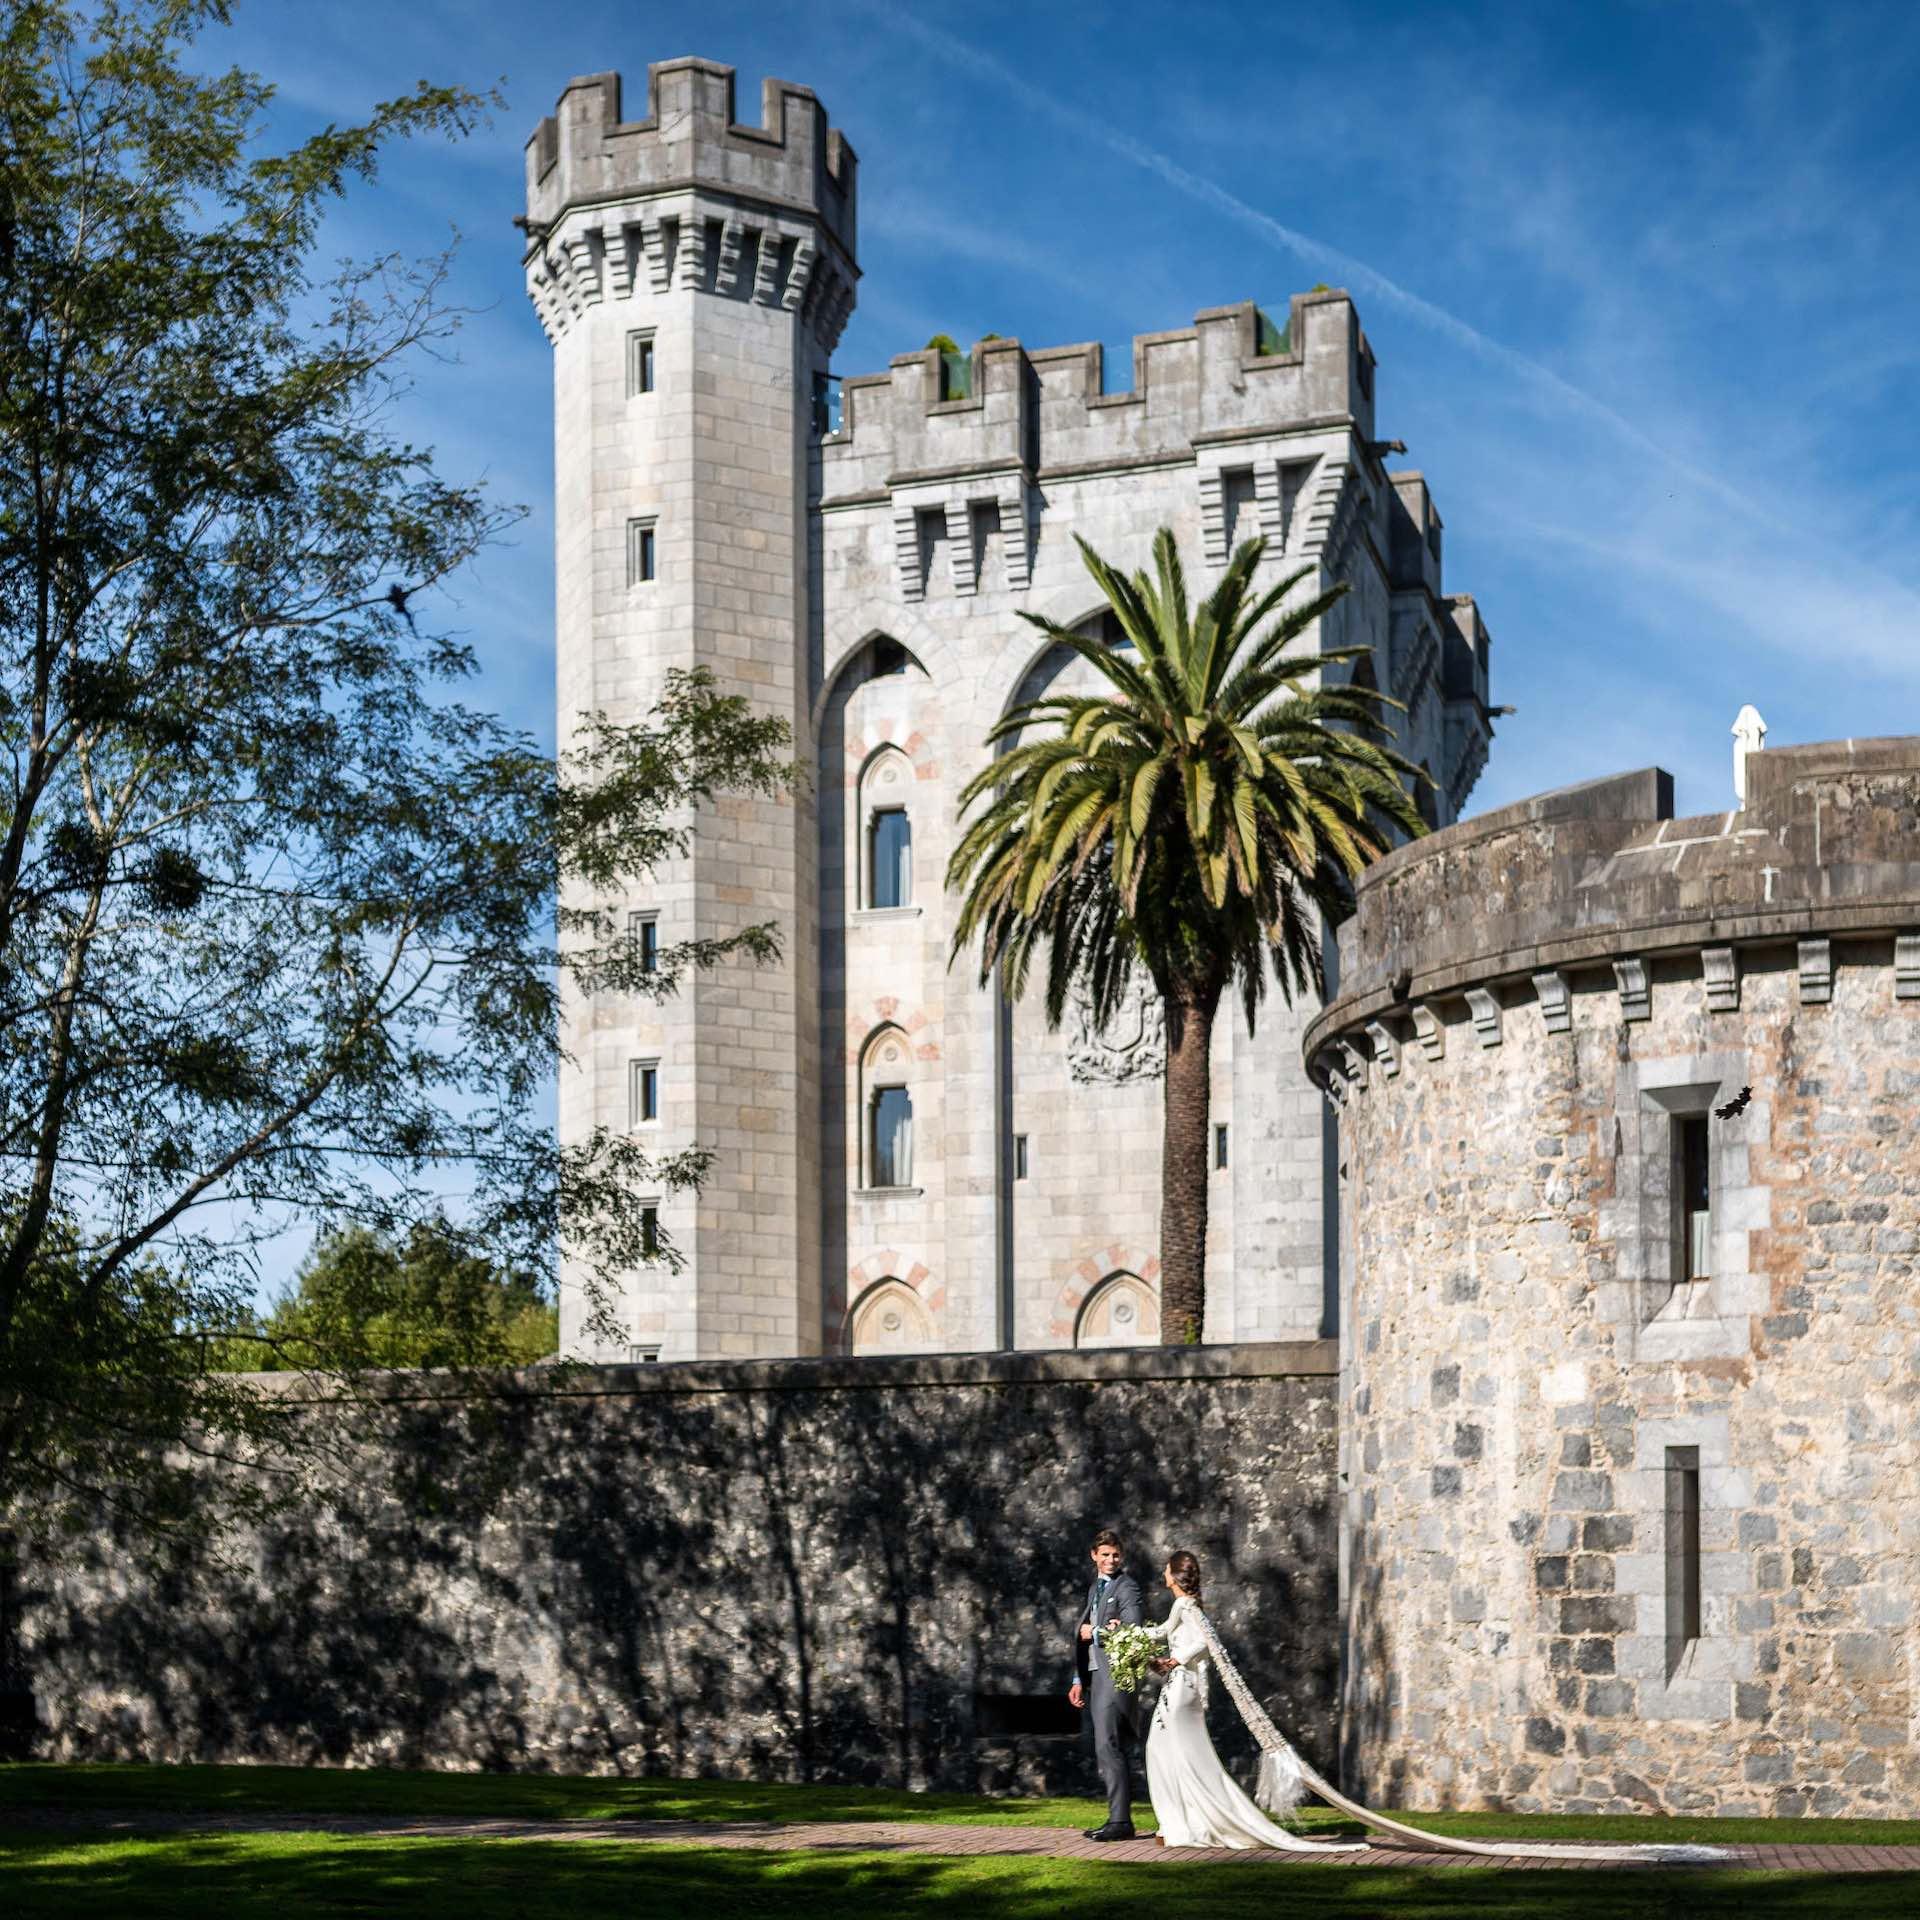 Boda castillo de Arteaga - Navascues - Itziar Ortuondo - Man